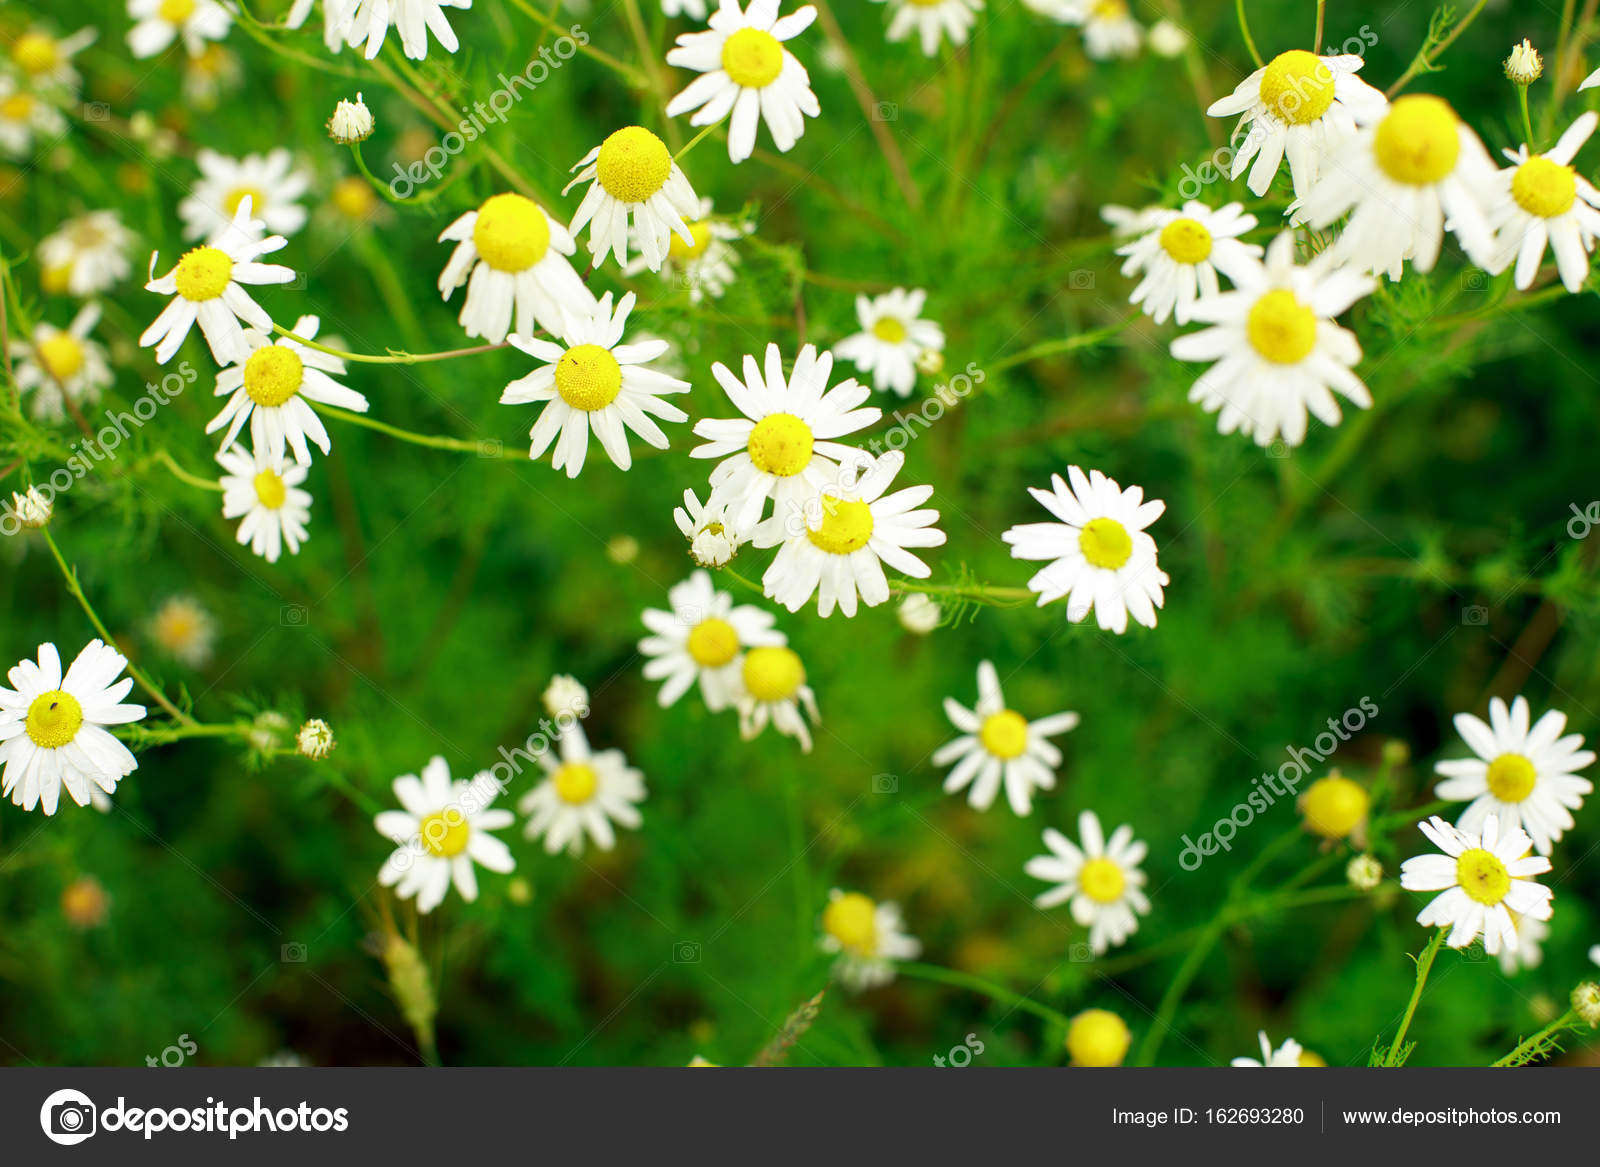 Summer field of daisy flowers stock photo arkusha 162693280 summer field of daisy flowers stock photo izmirmasajfo